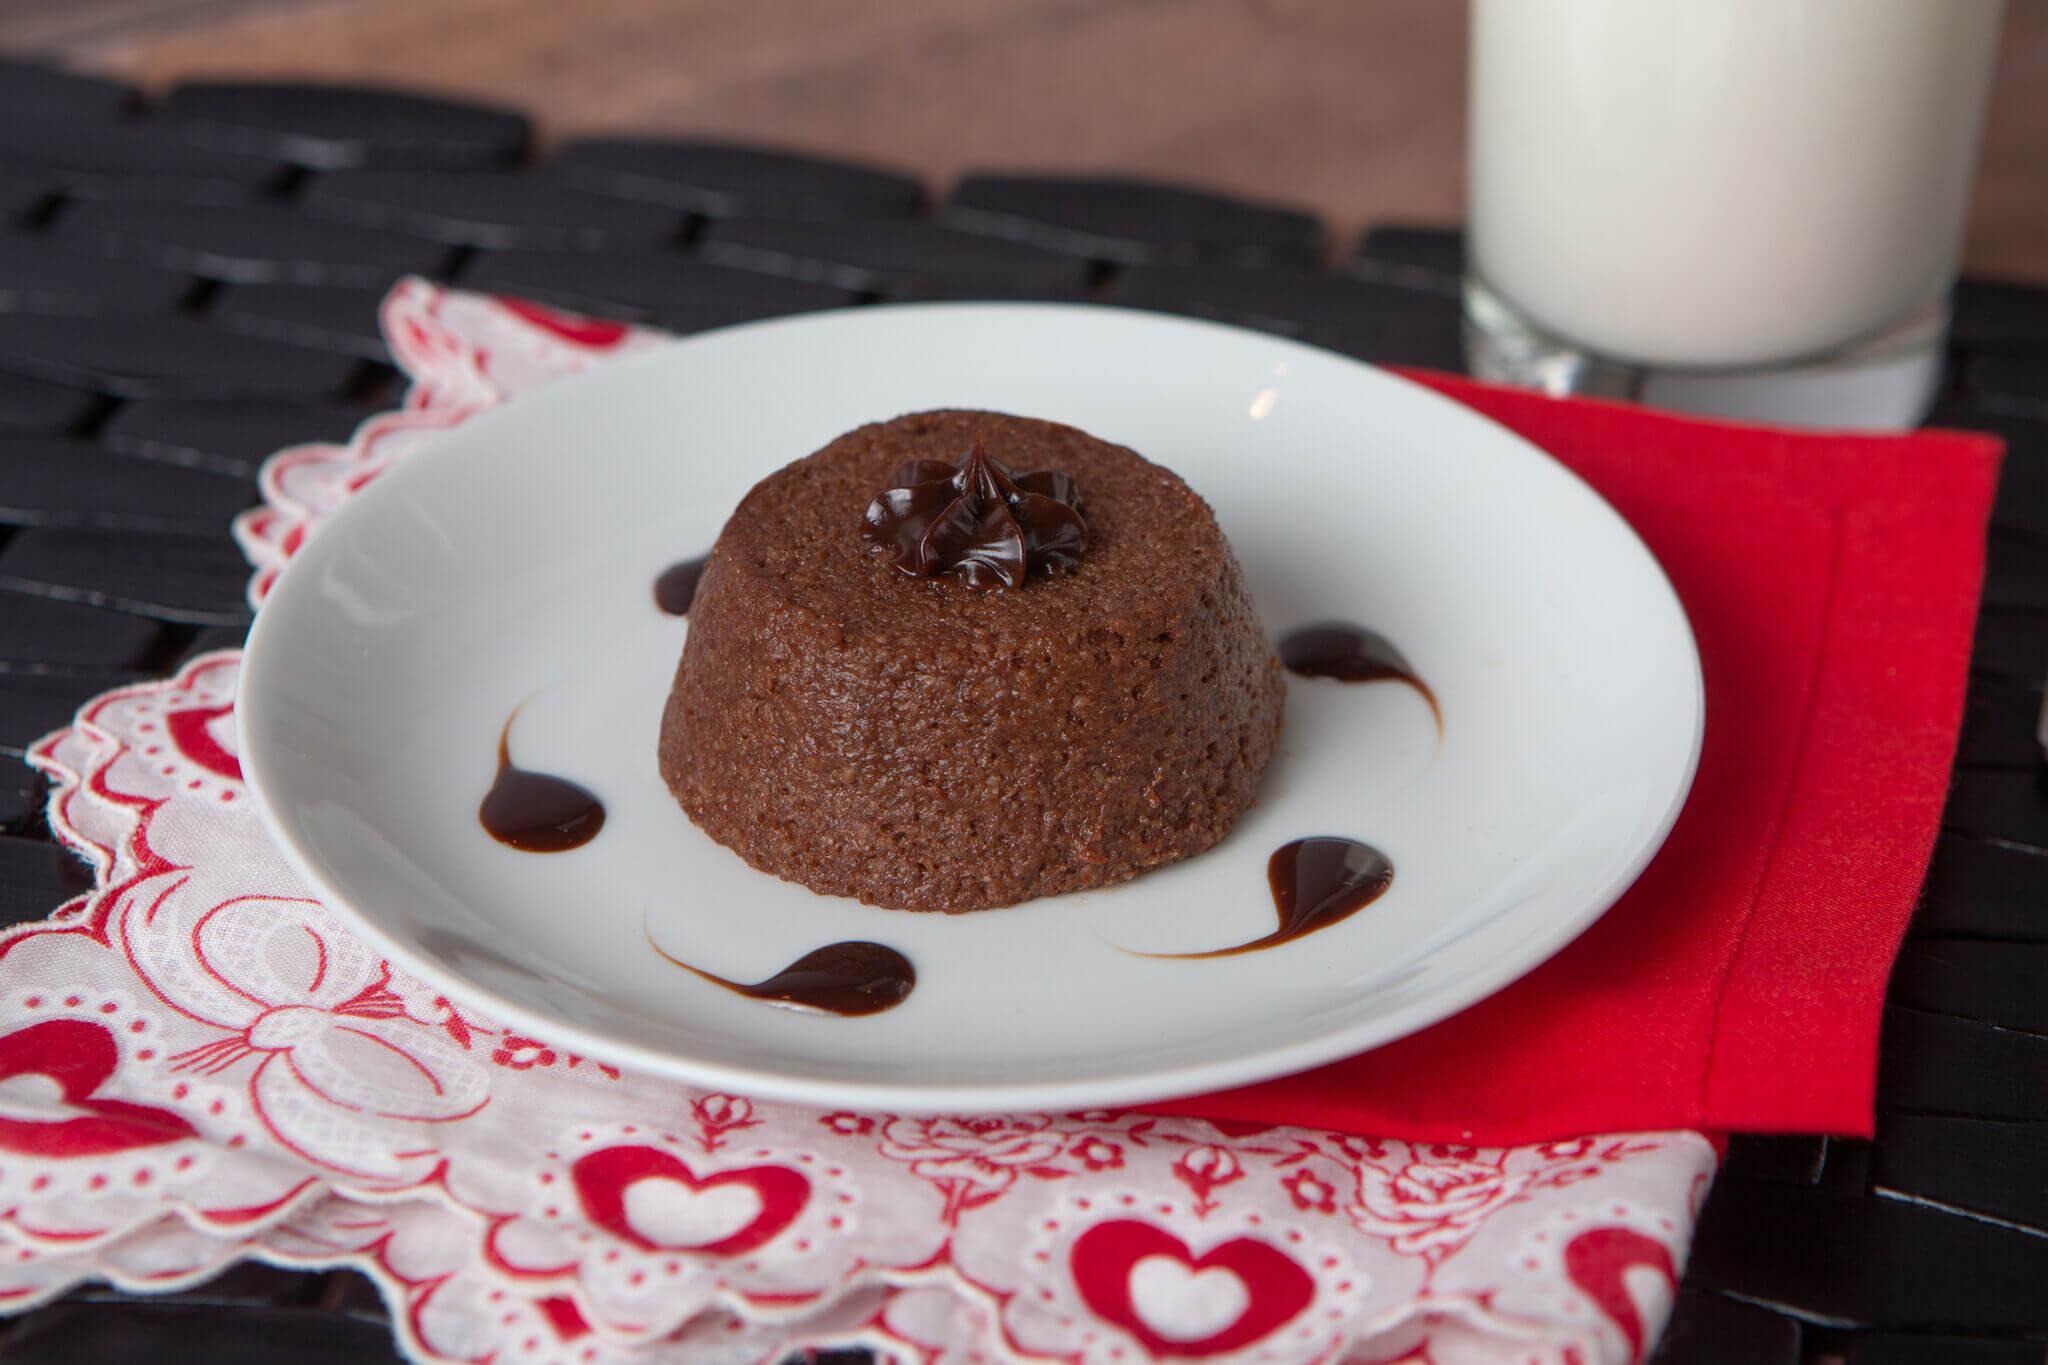 A pureed chocolate lava cake on a plate